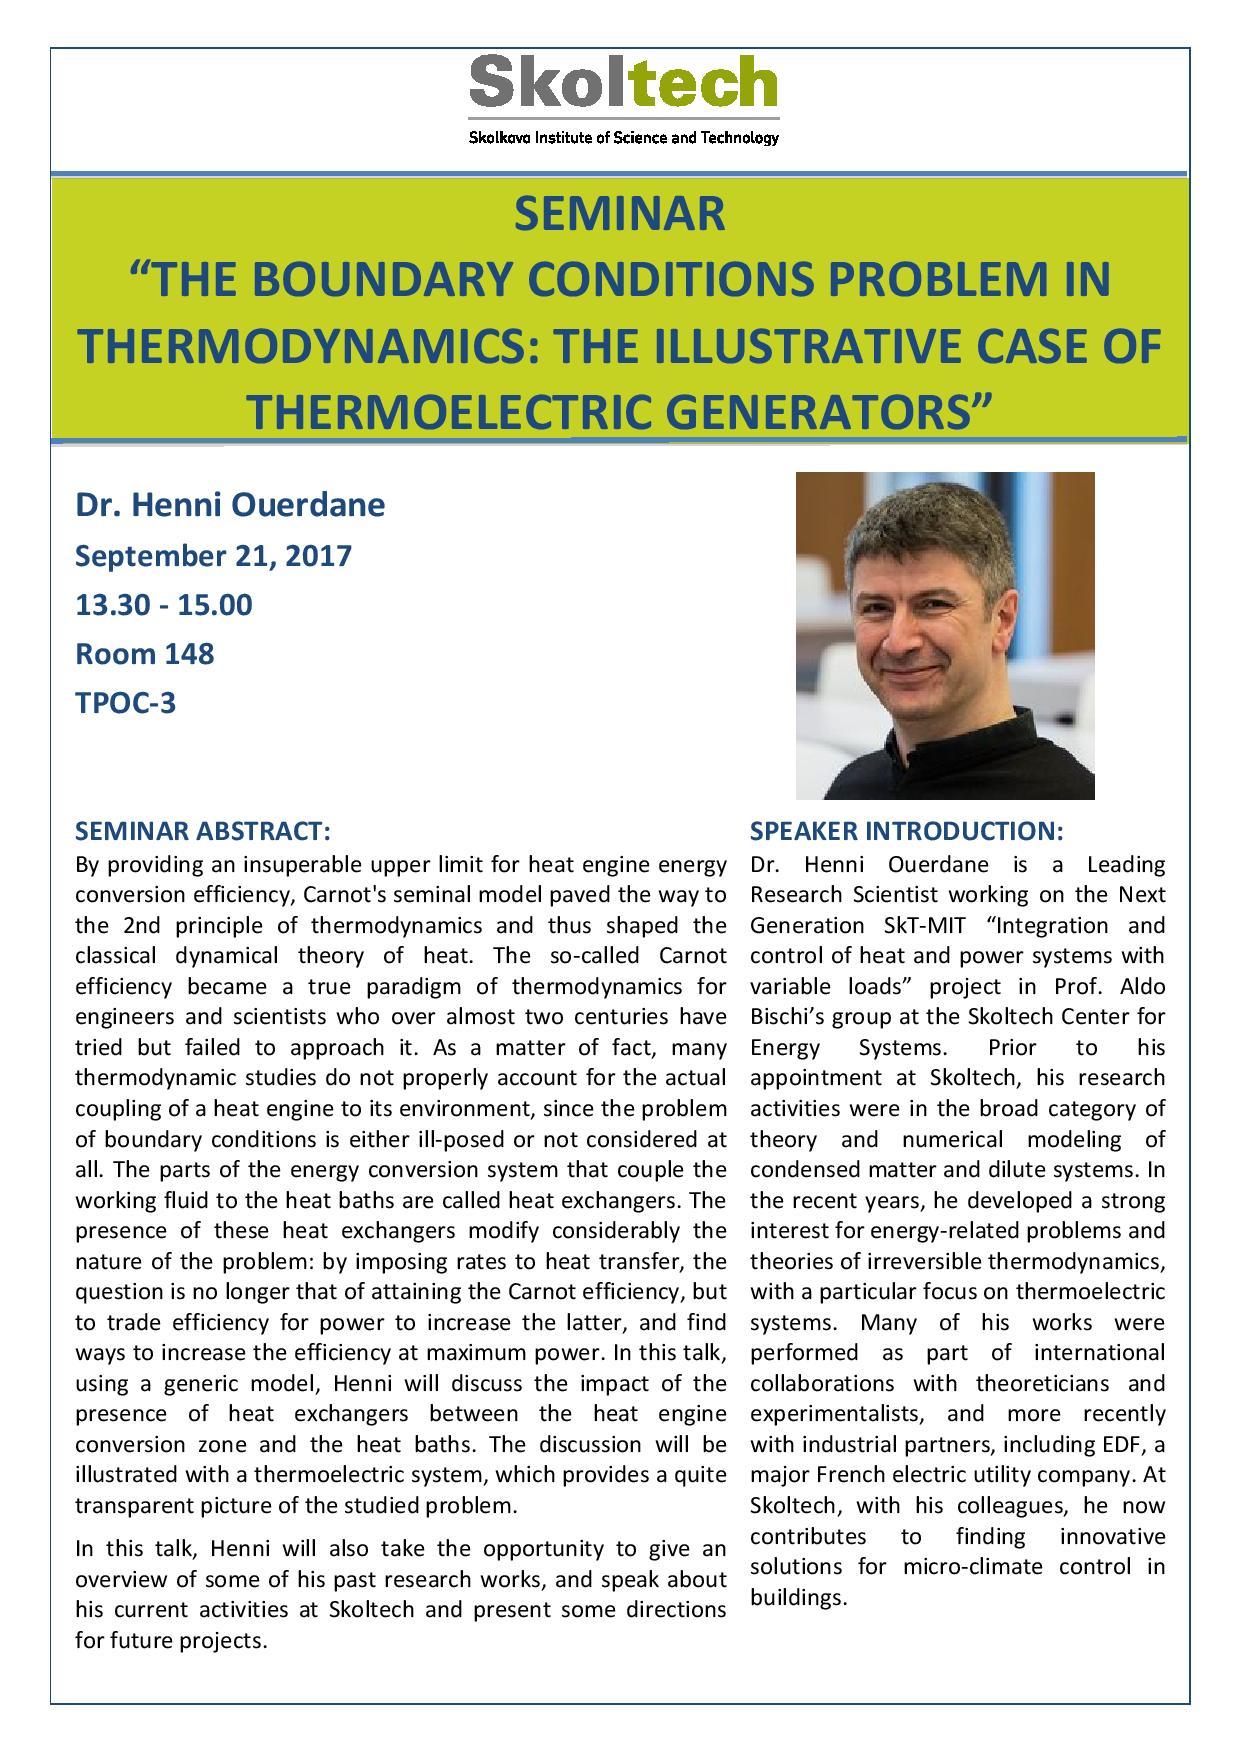 dr-henni-ouerdane-september-21-seminar-announcementeng-page-001